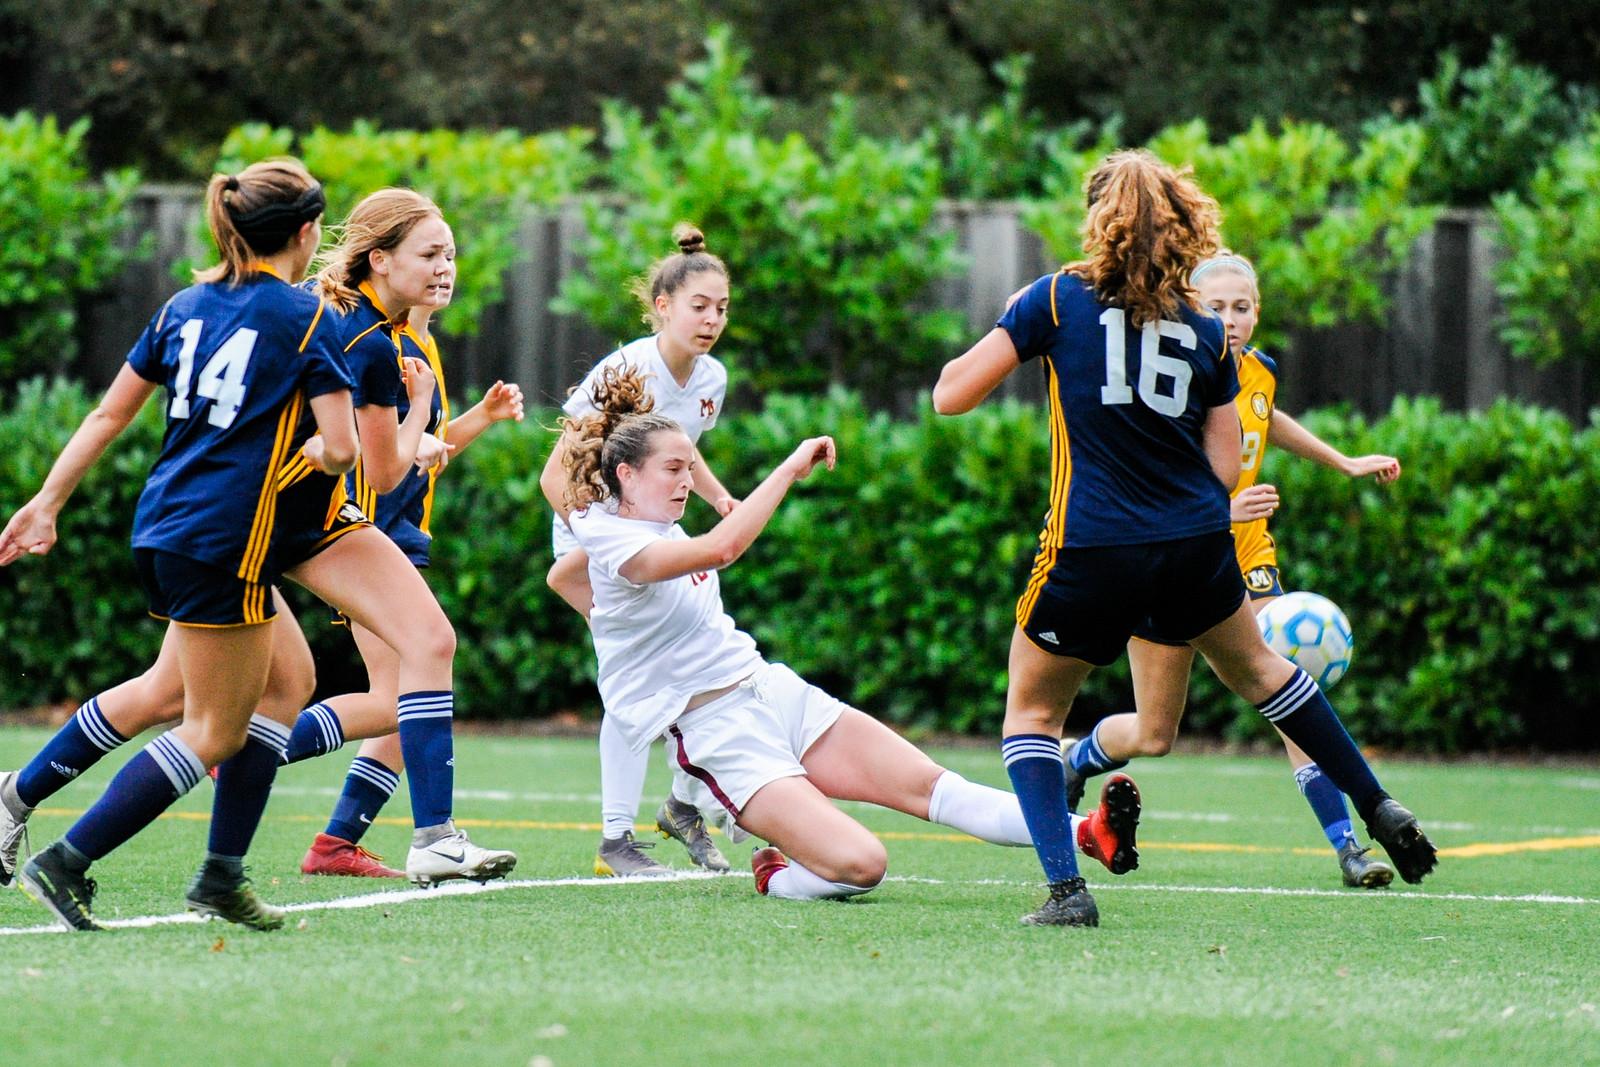 Girls soccer ties rival Menlo to open the 2019-20 season